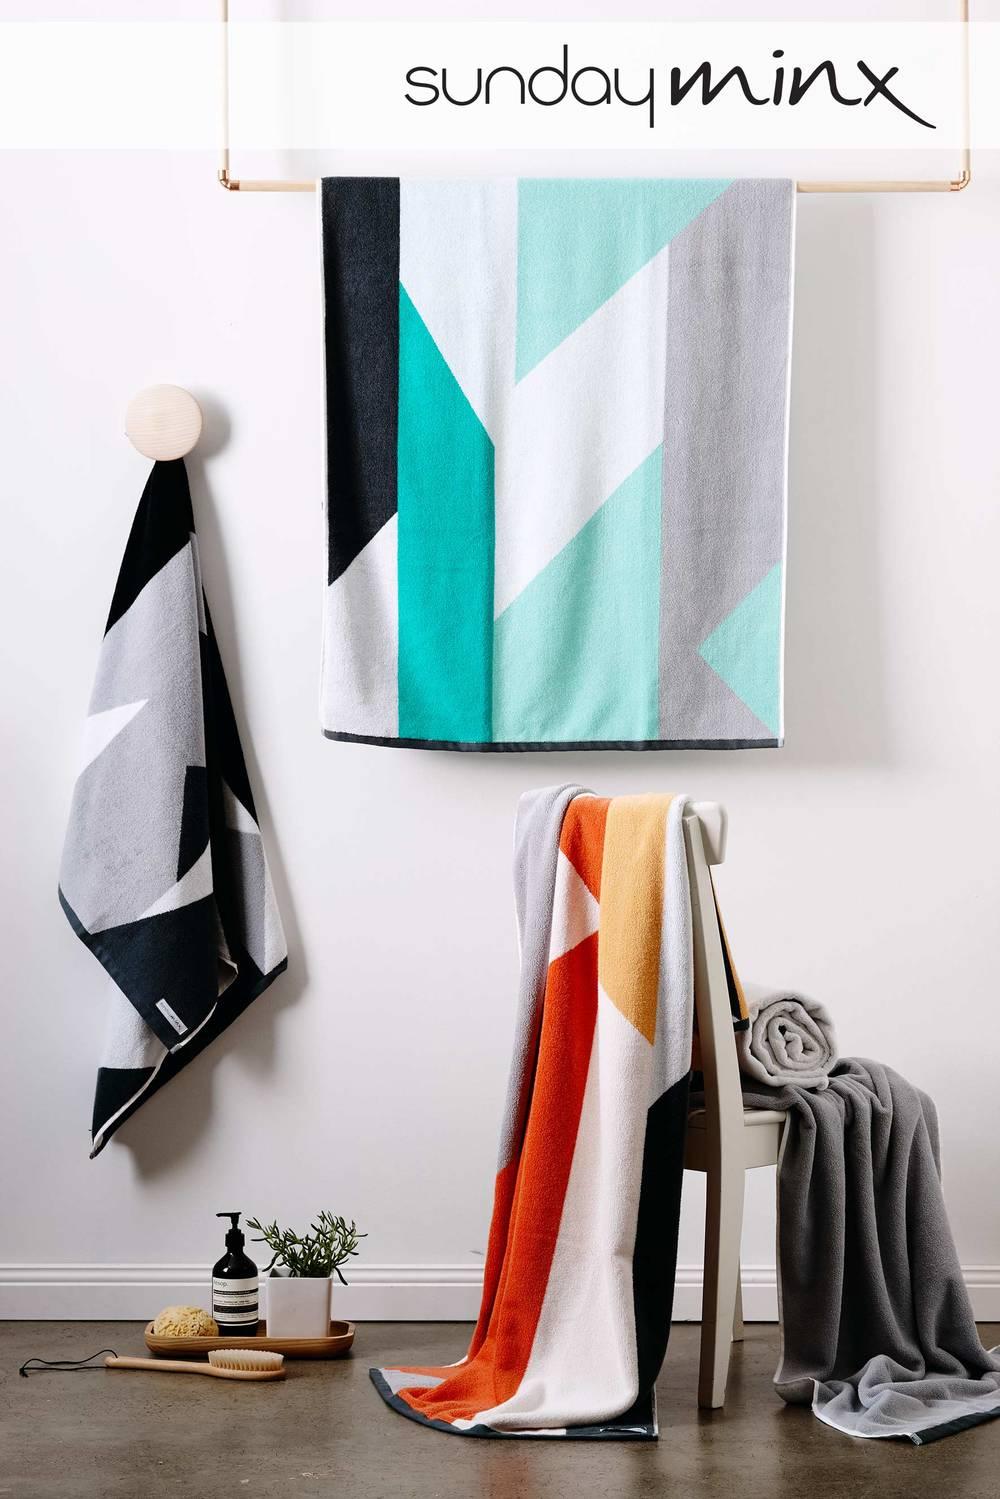 Jacquard Towel design for Australian Homewares brandSunday Minx